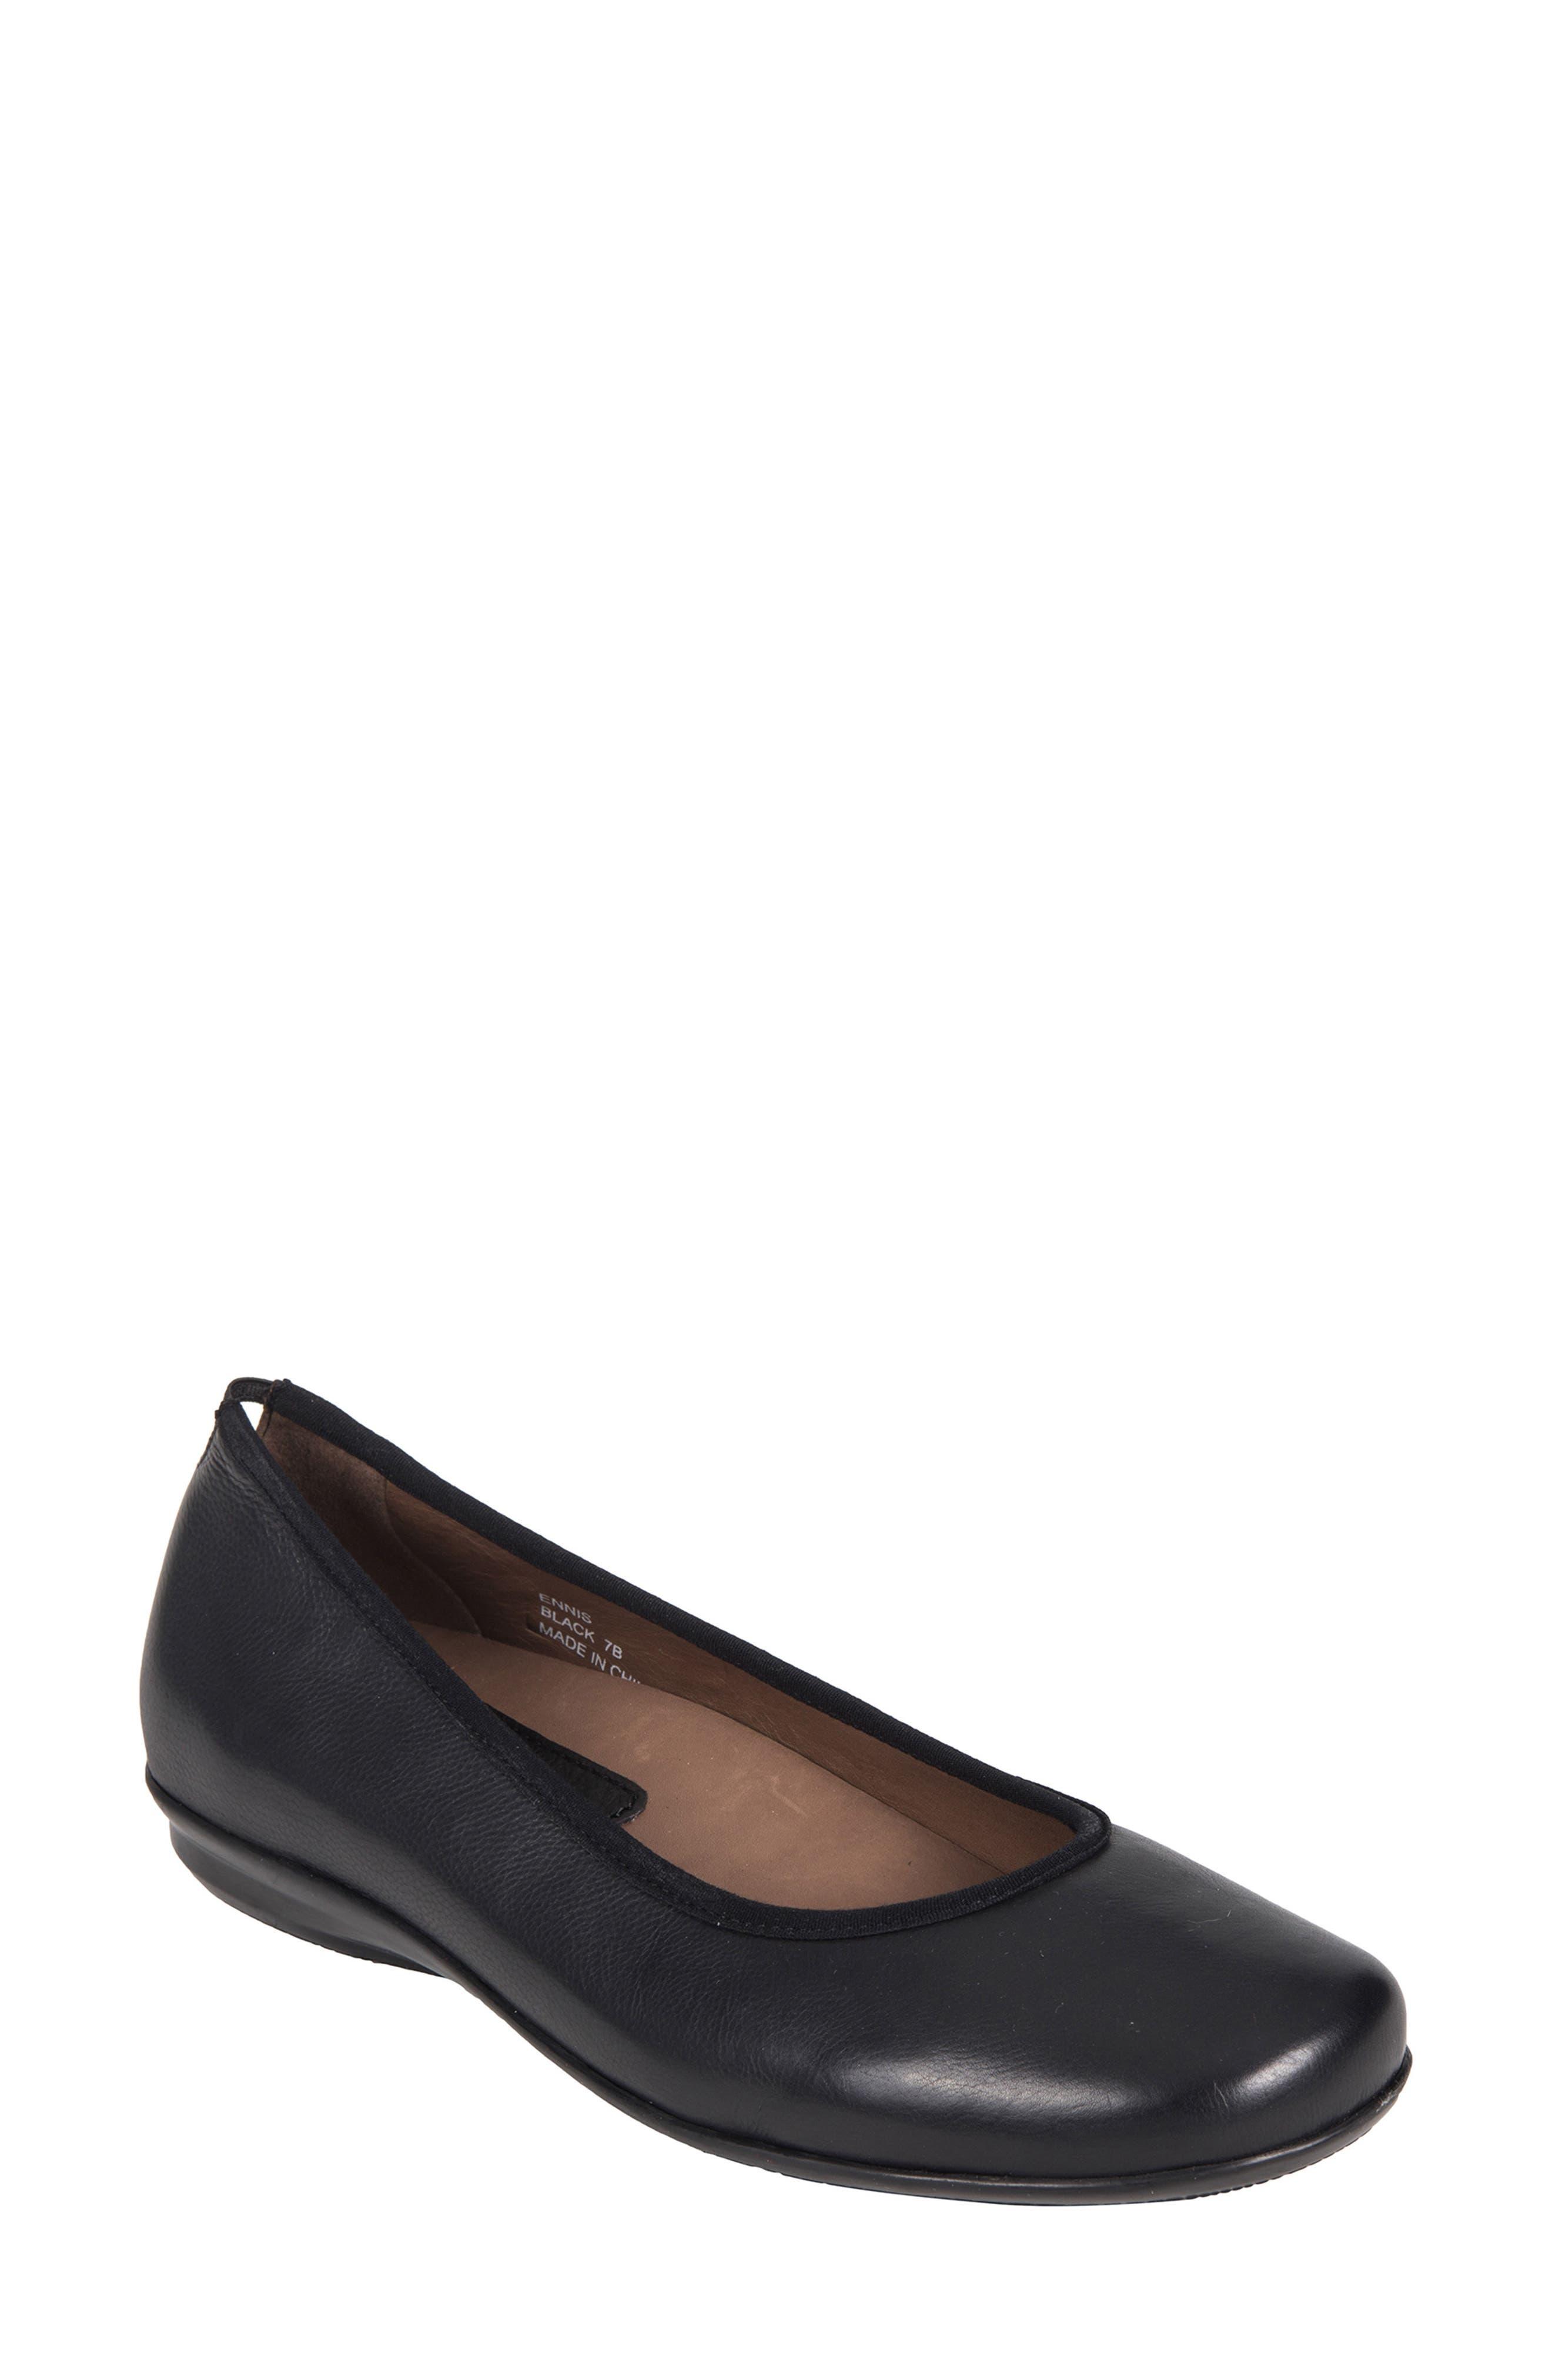 Ennis Flat,                         Main,                         color, Black Leather